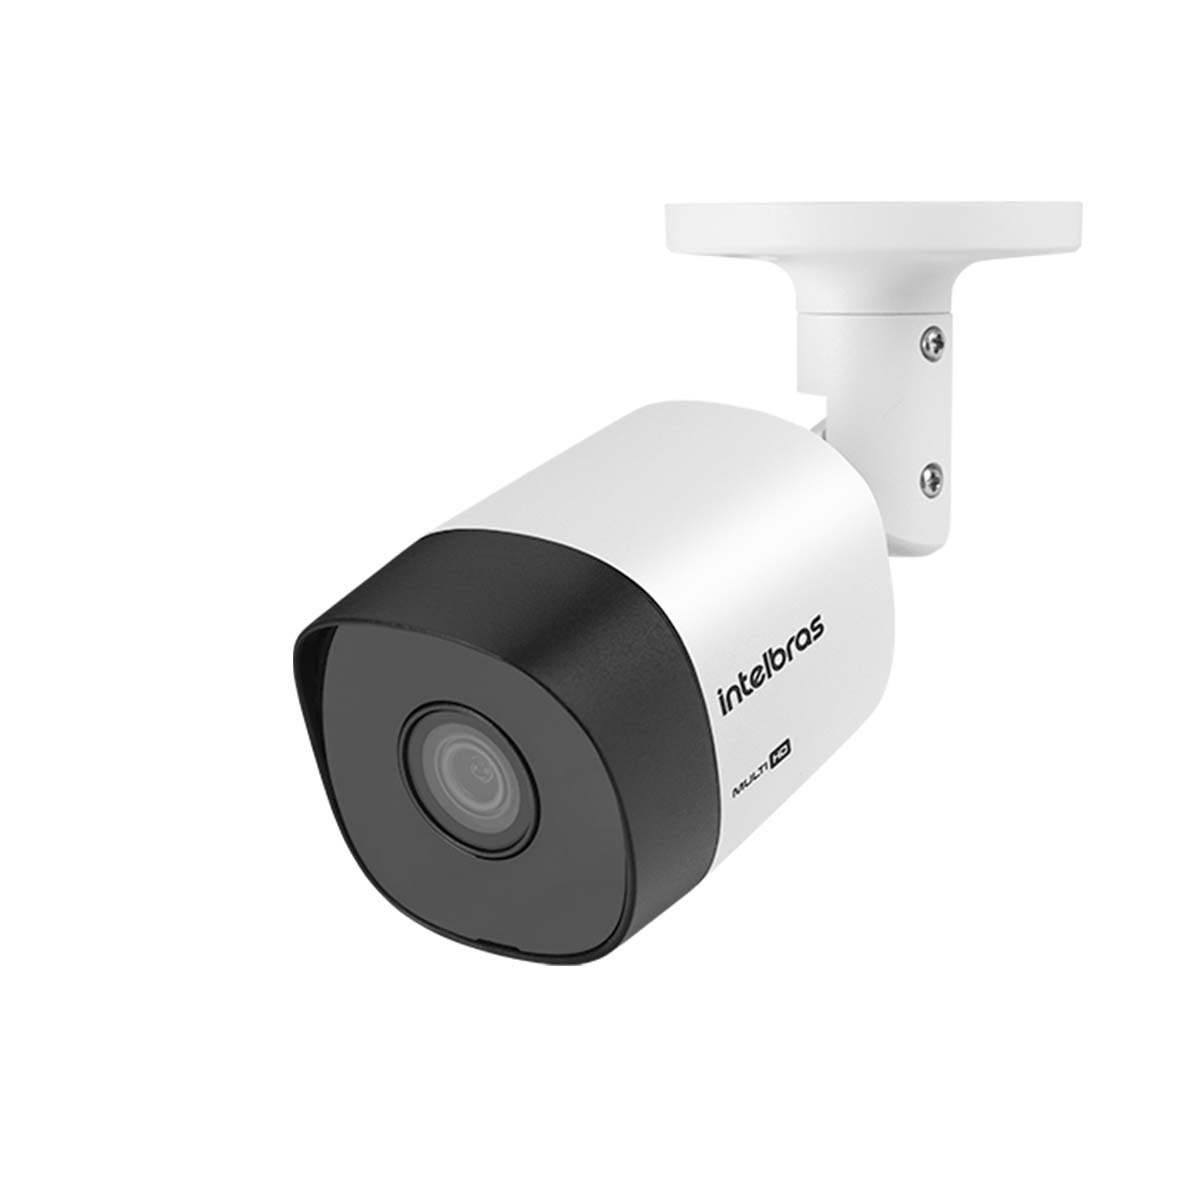 Kit 09 Câmera Bullet Intelbras Vhd 3120 B G6 720p 3,6mm